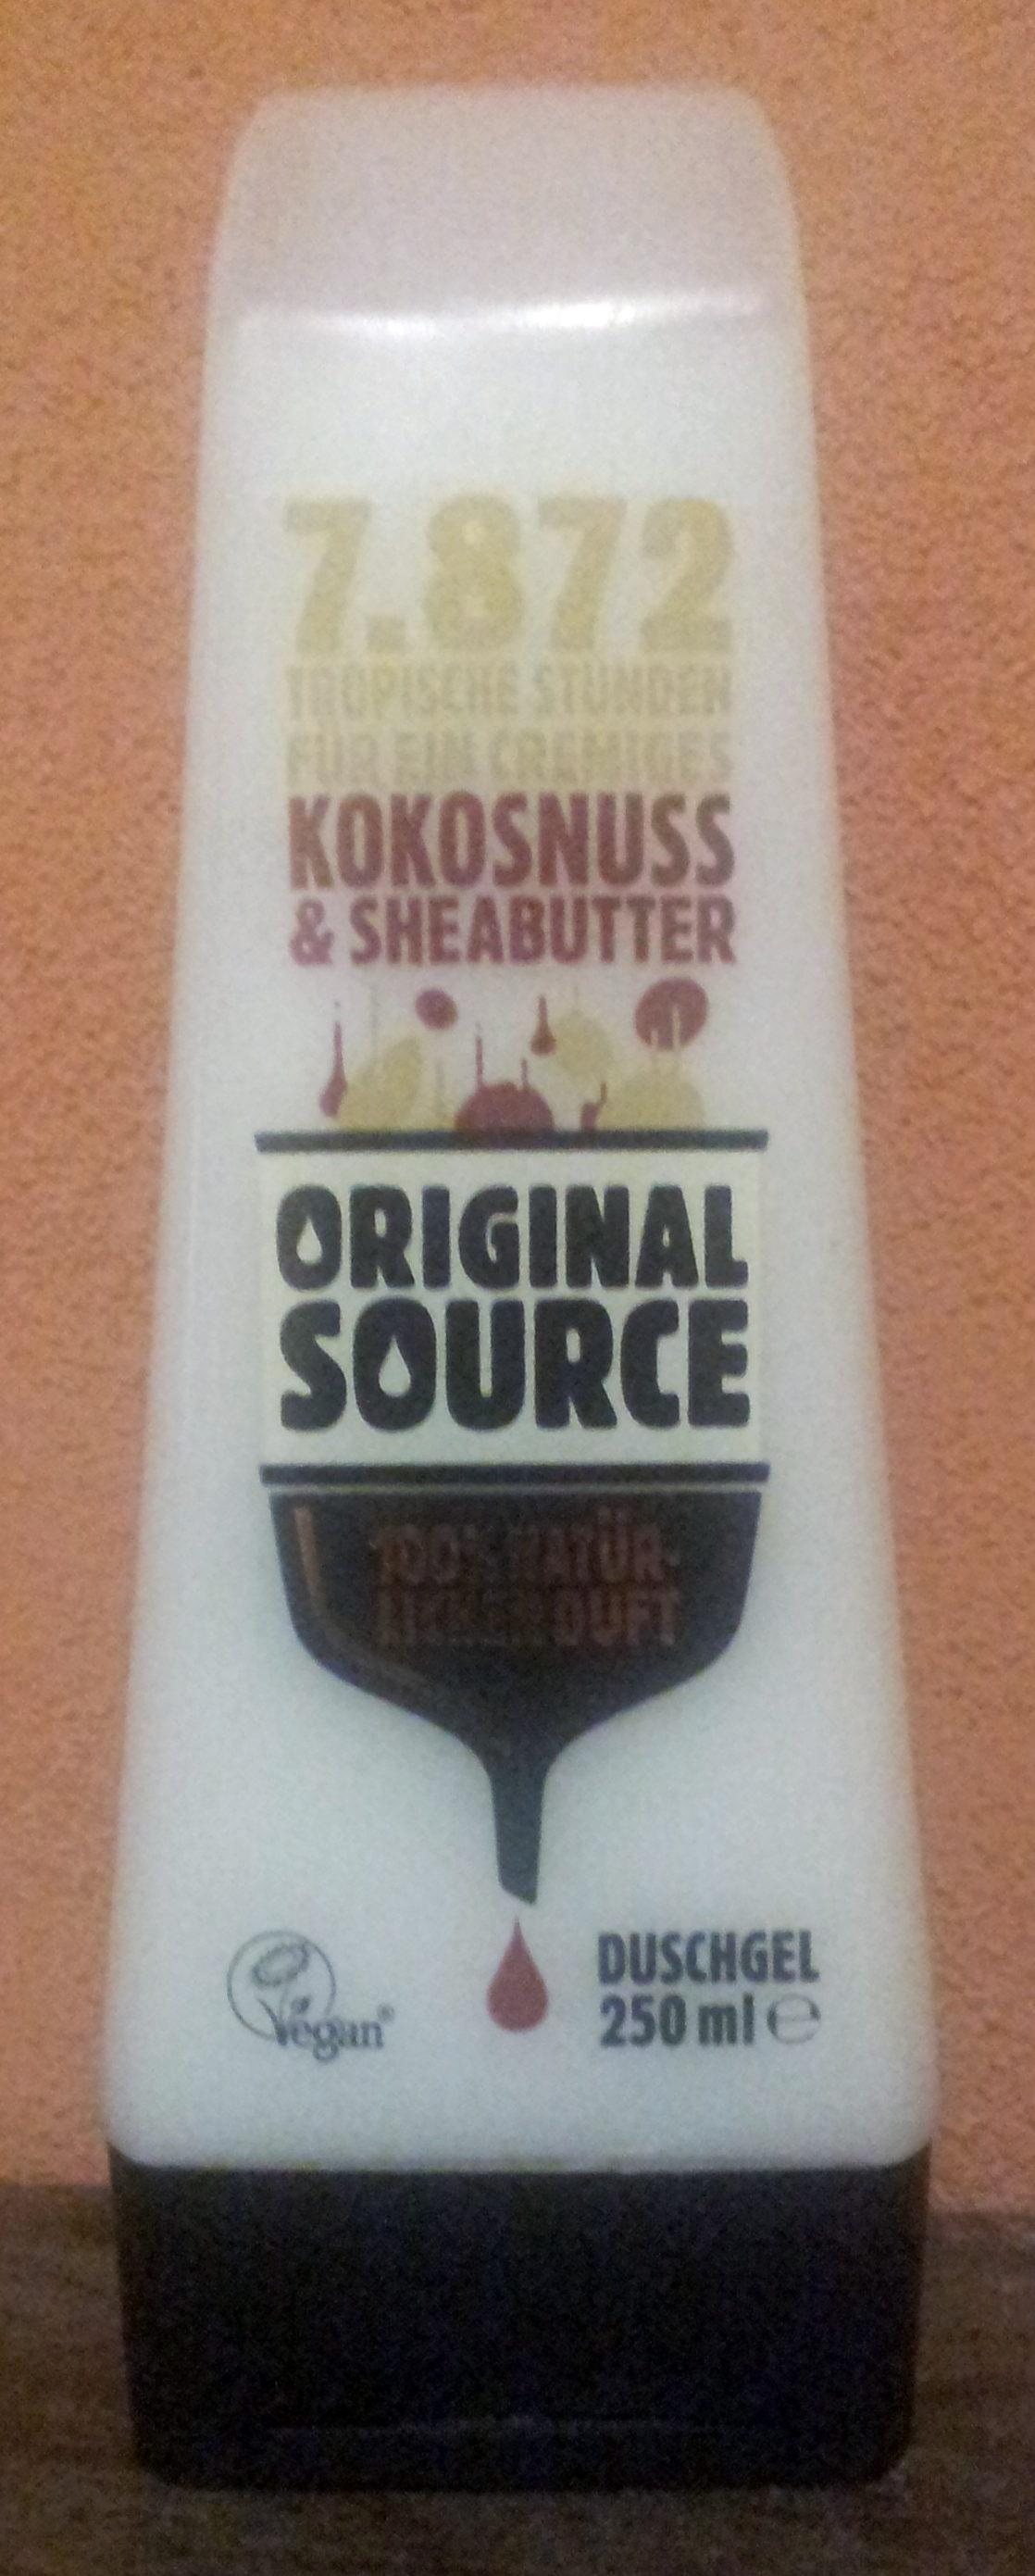 Original Source Kokosnuss & Sheabutter - Product - de